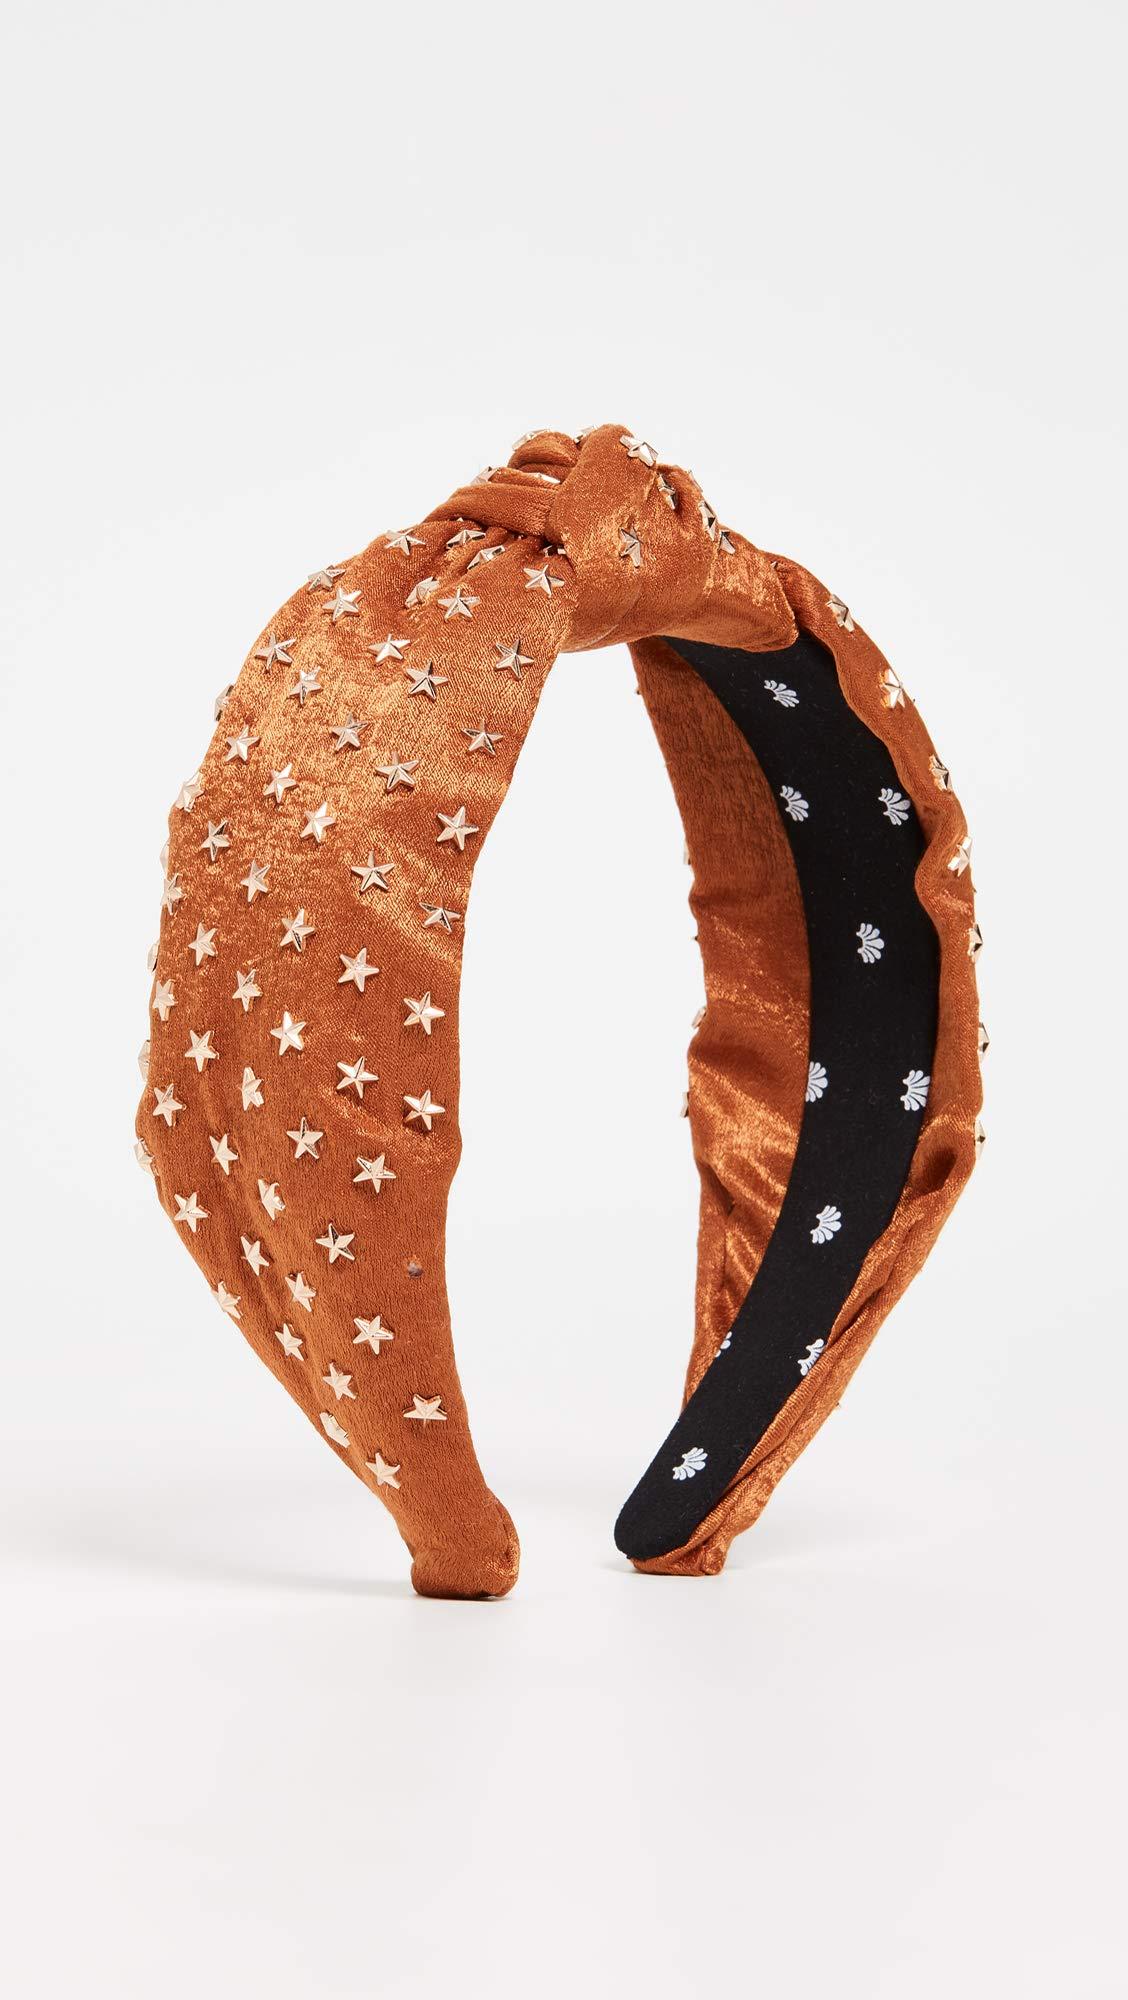 Lele Sadoughi Women's Star Studded Silk Knotted Headband, Copper, Metallic, Bronze, Orange, One Size by Lele Sadoughi (Image #2)